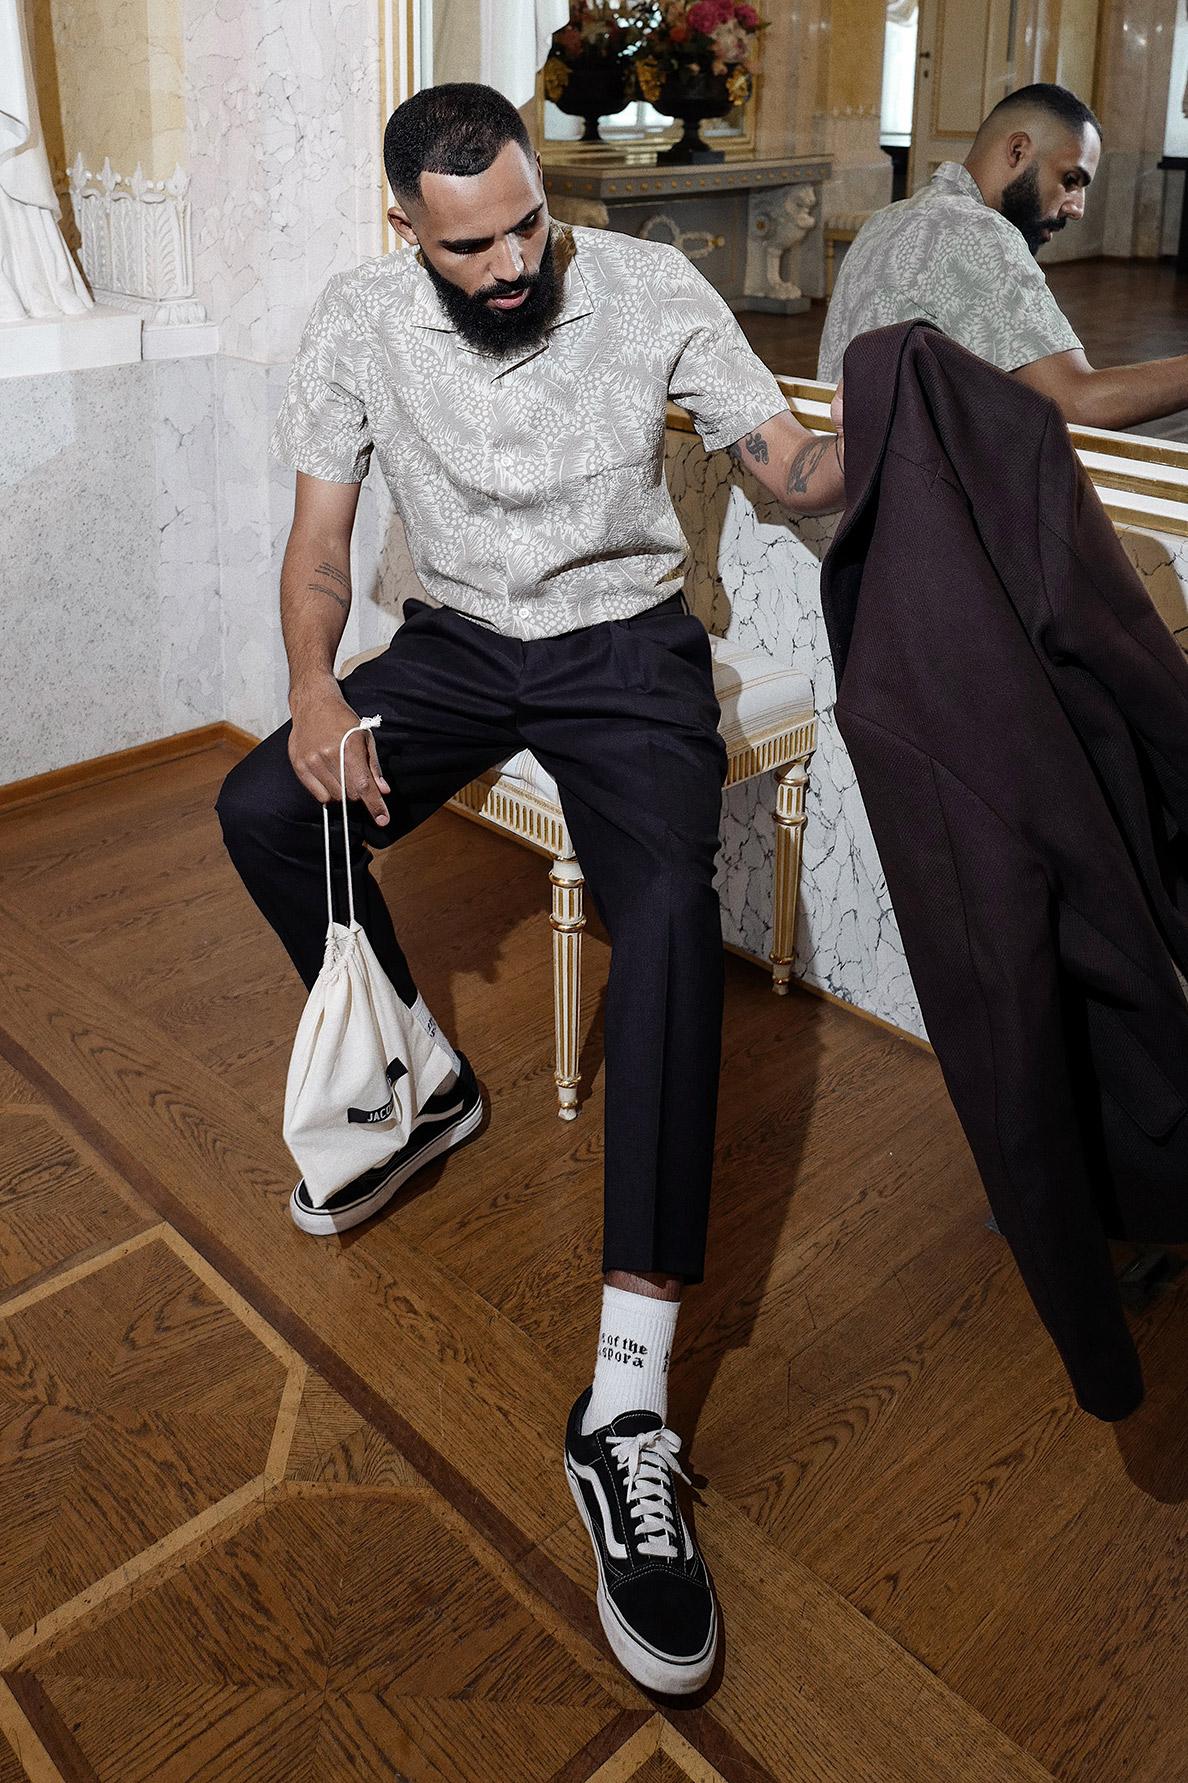 Menswear Guide mit MR PORTER: So trägt man printed Shirts